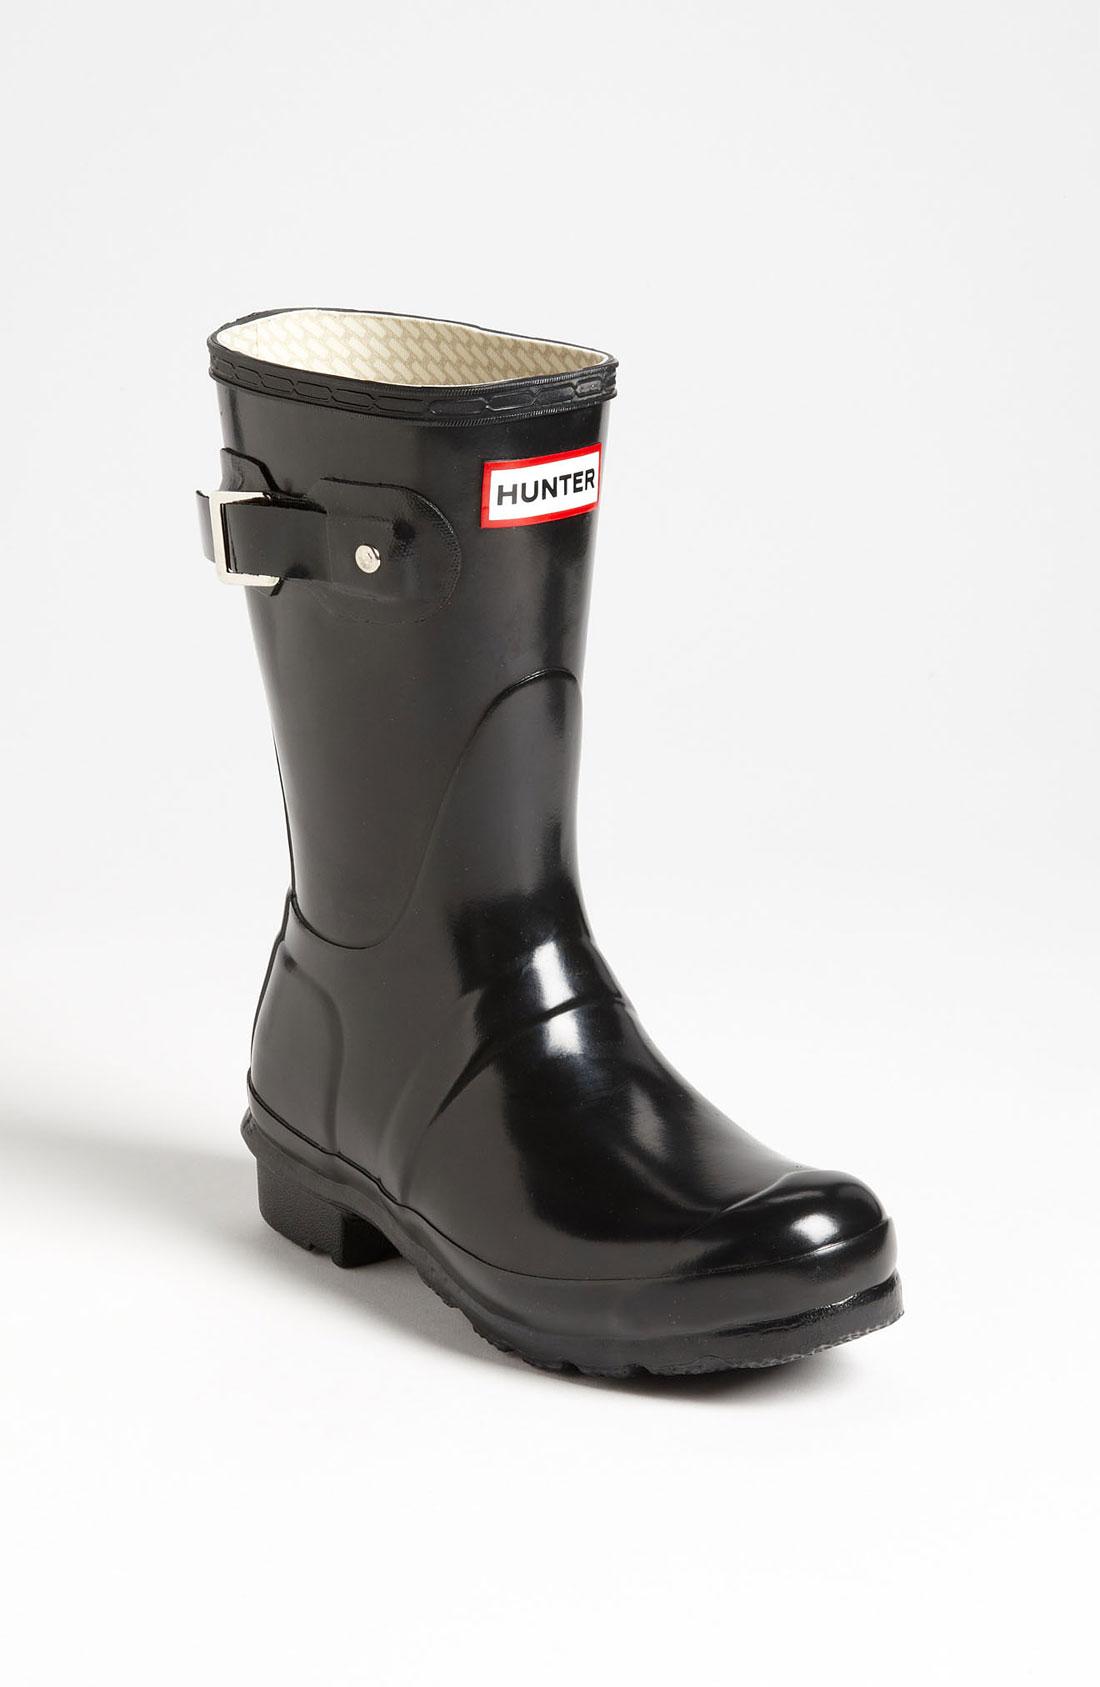 Innovative Women39s Clothing Women39s Shoes Amp Footwear Women39s Rain Boots